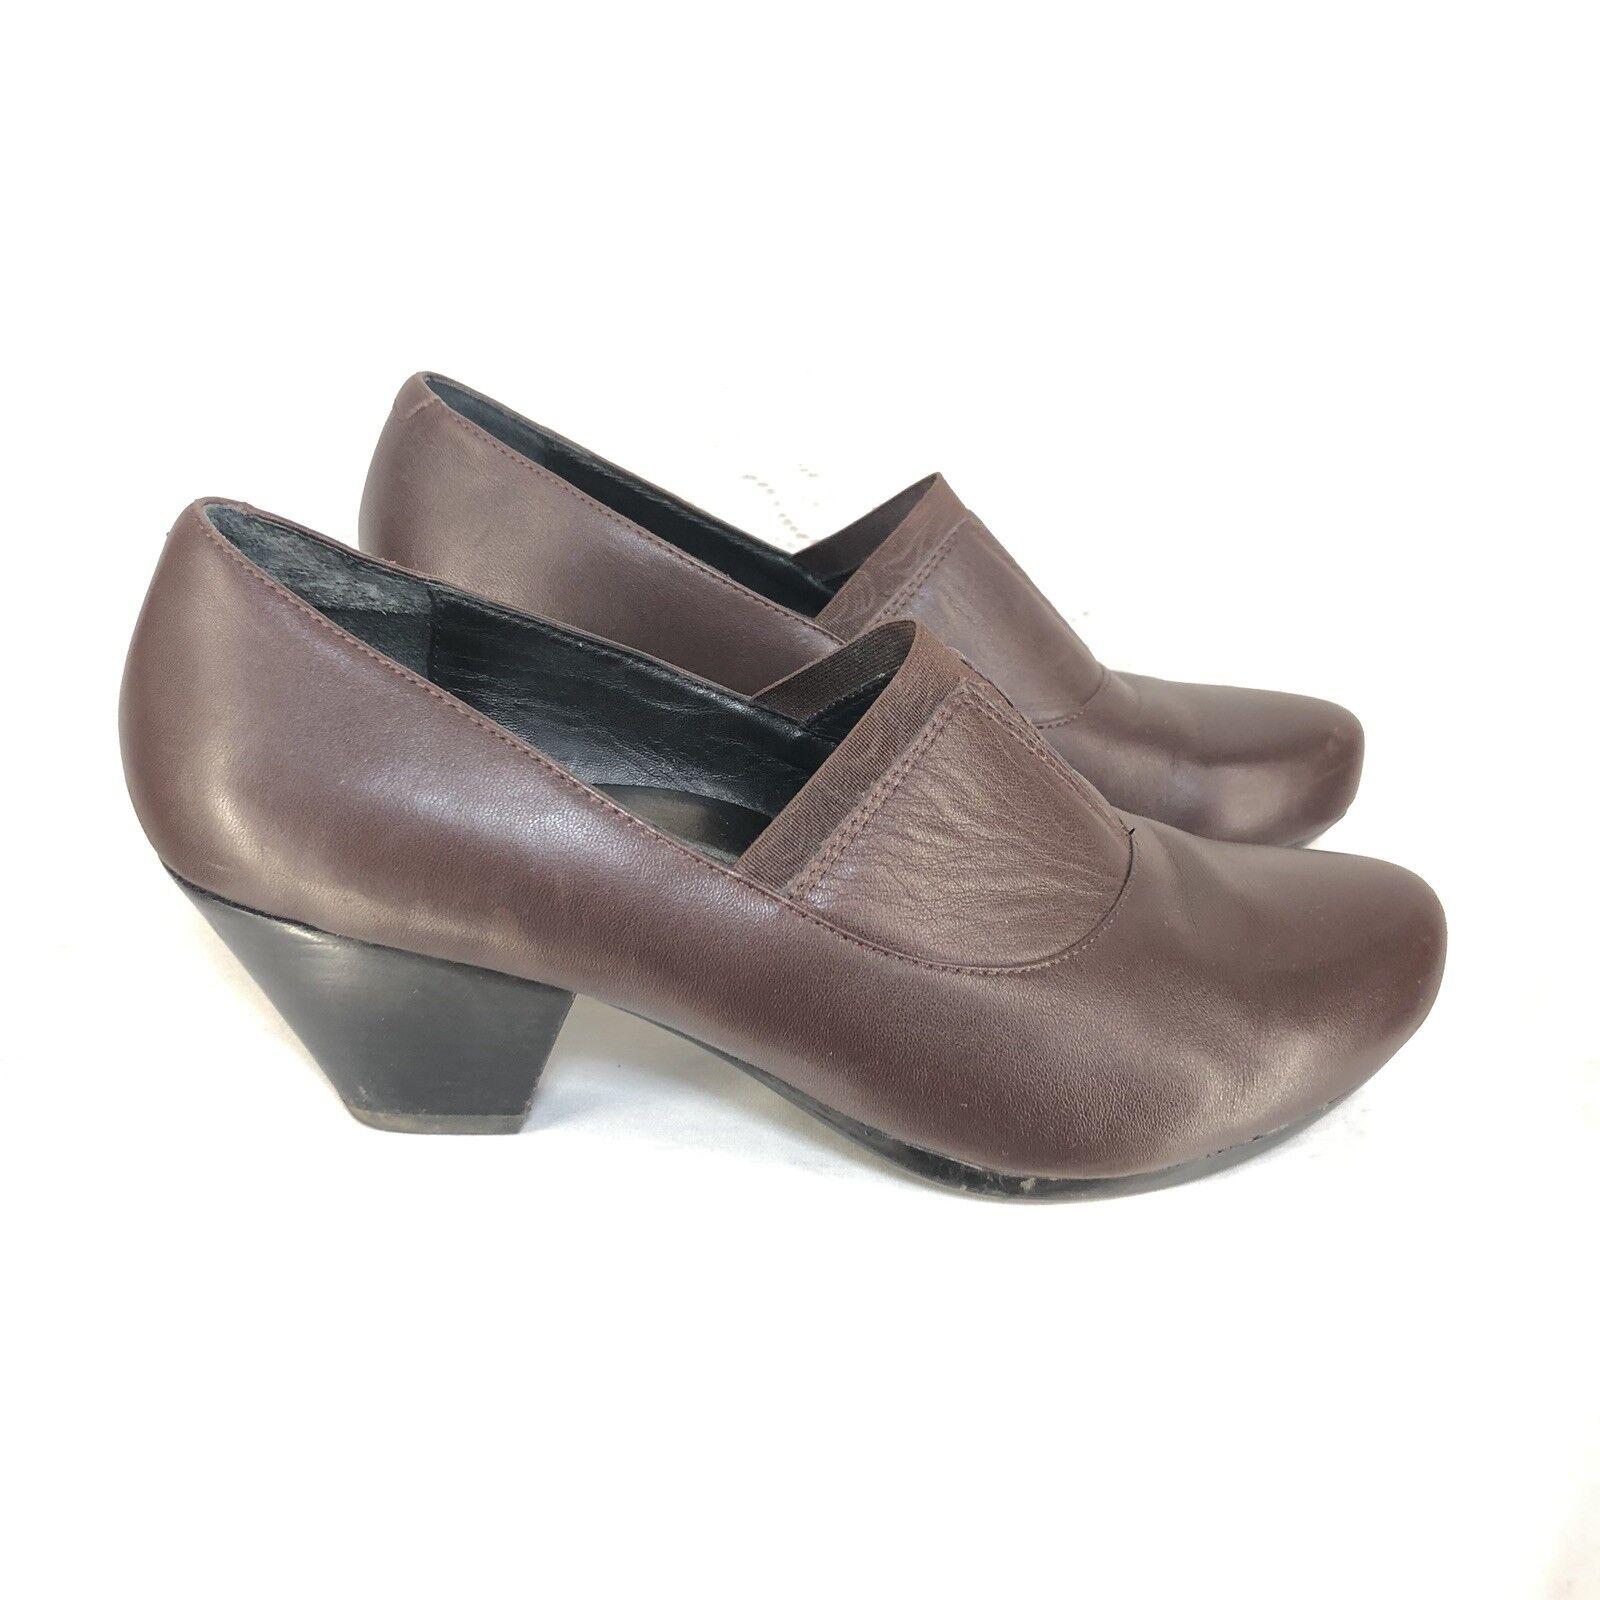 B52 Dansko damen Chunky Heel schuhe Sz 7.5 - - - 8   38 braun Leather Loafer Stiefelie 9791a0